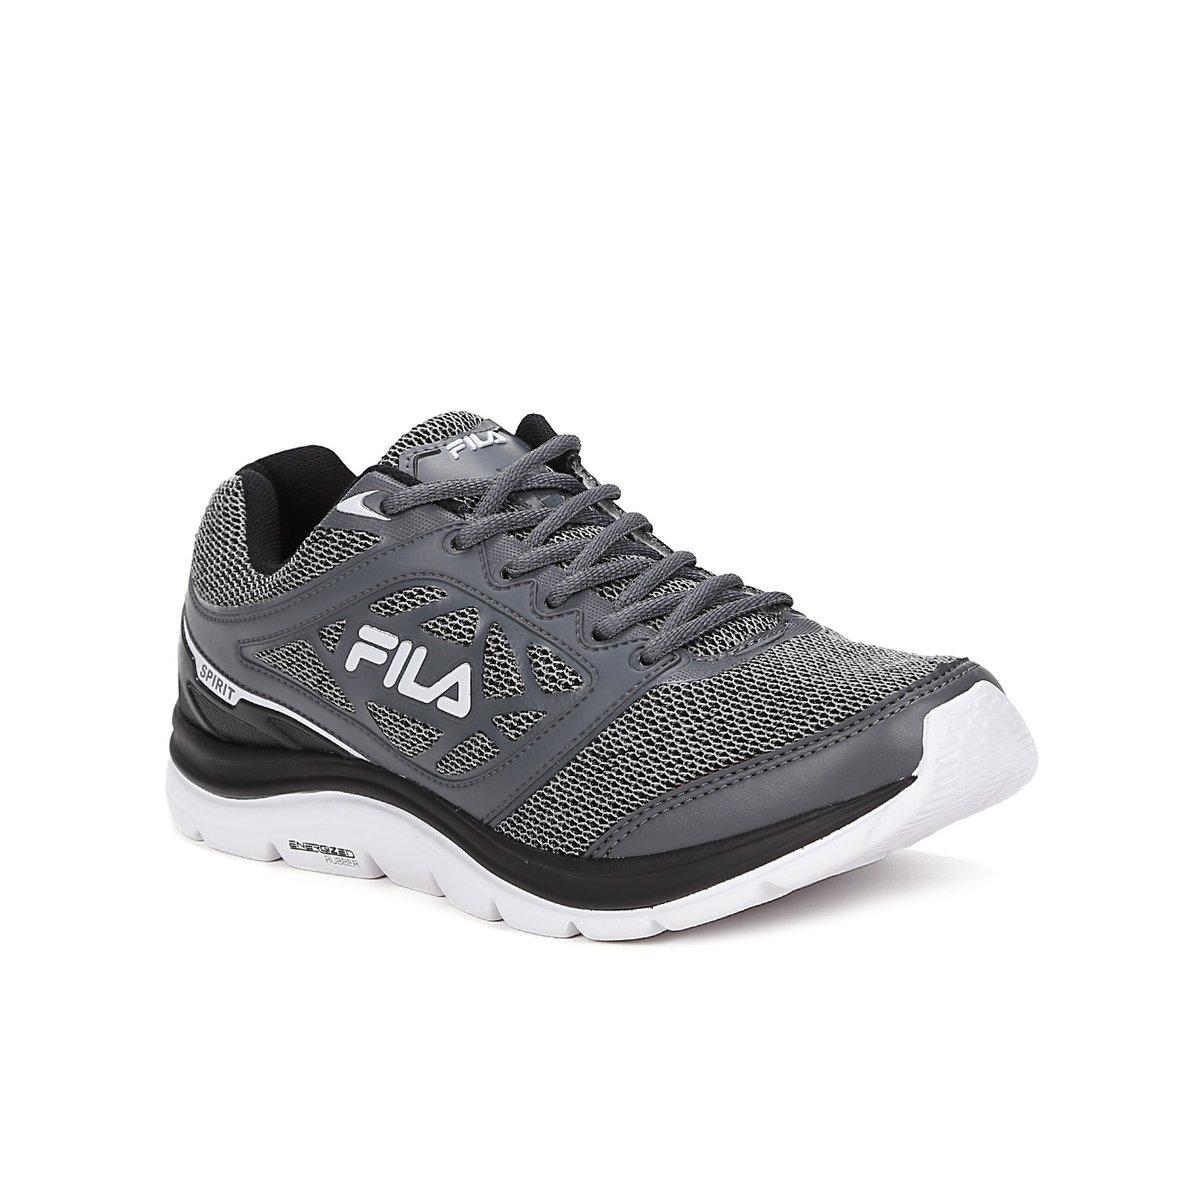 ec0f2fa5e1 Tênis Esportivo Masculino Fila - Compre Agora